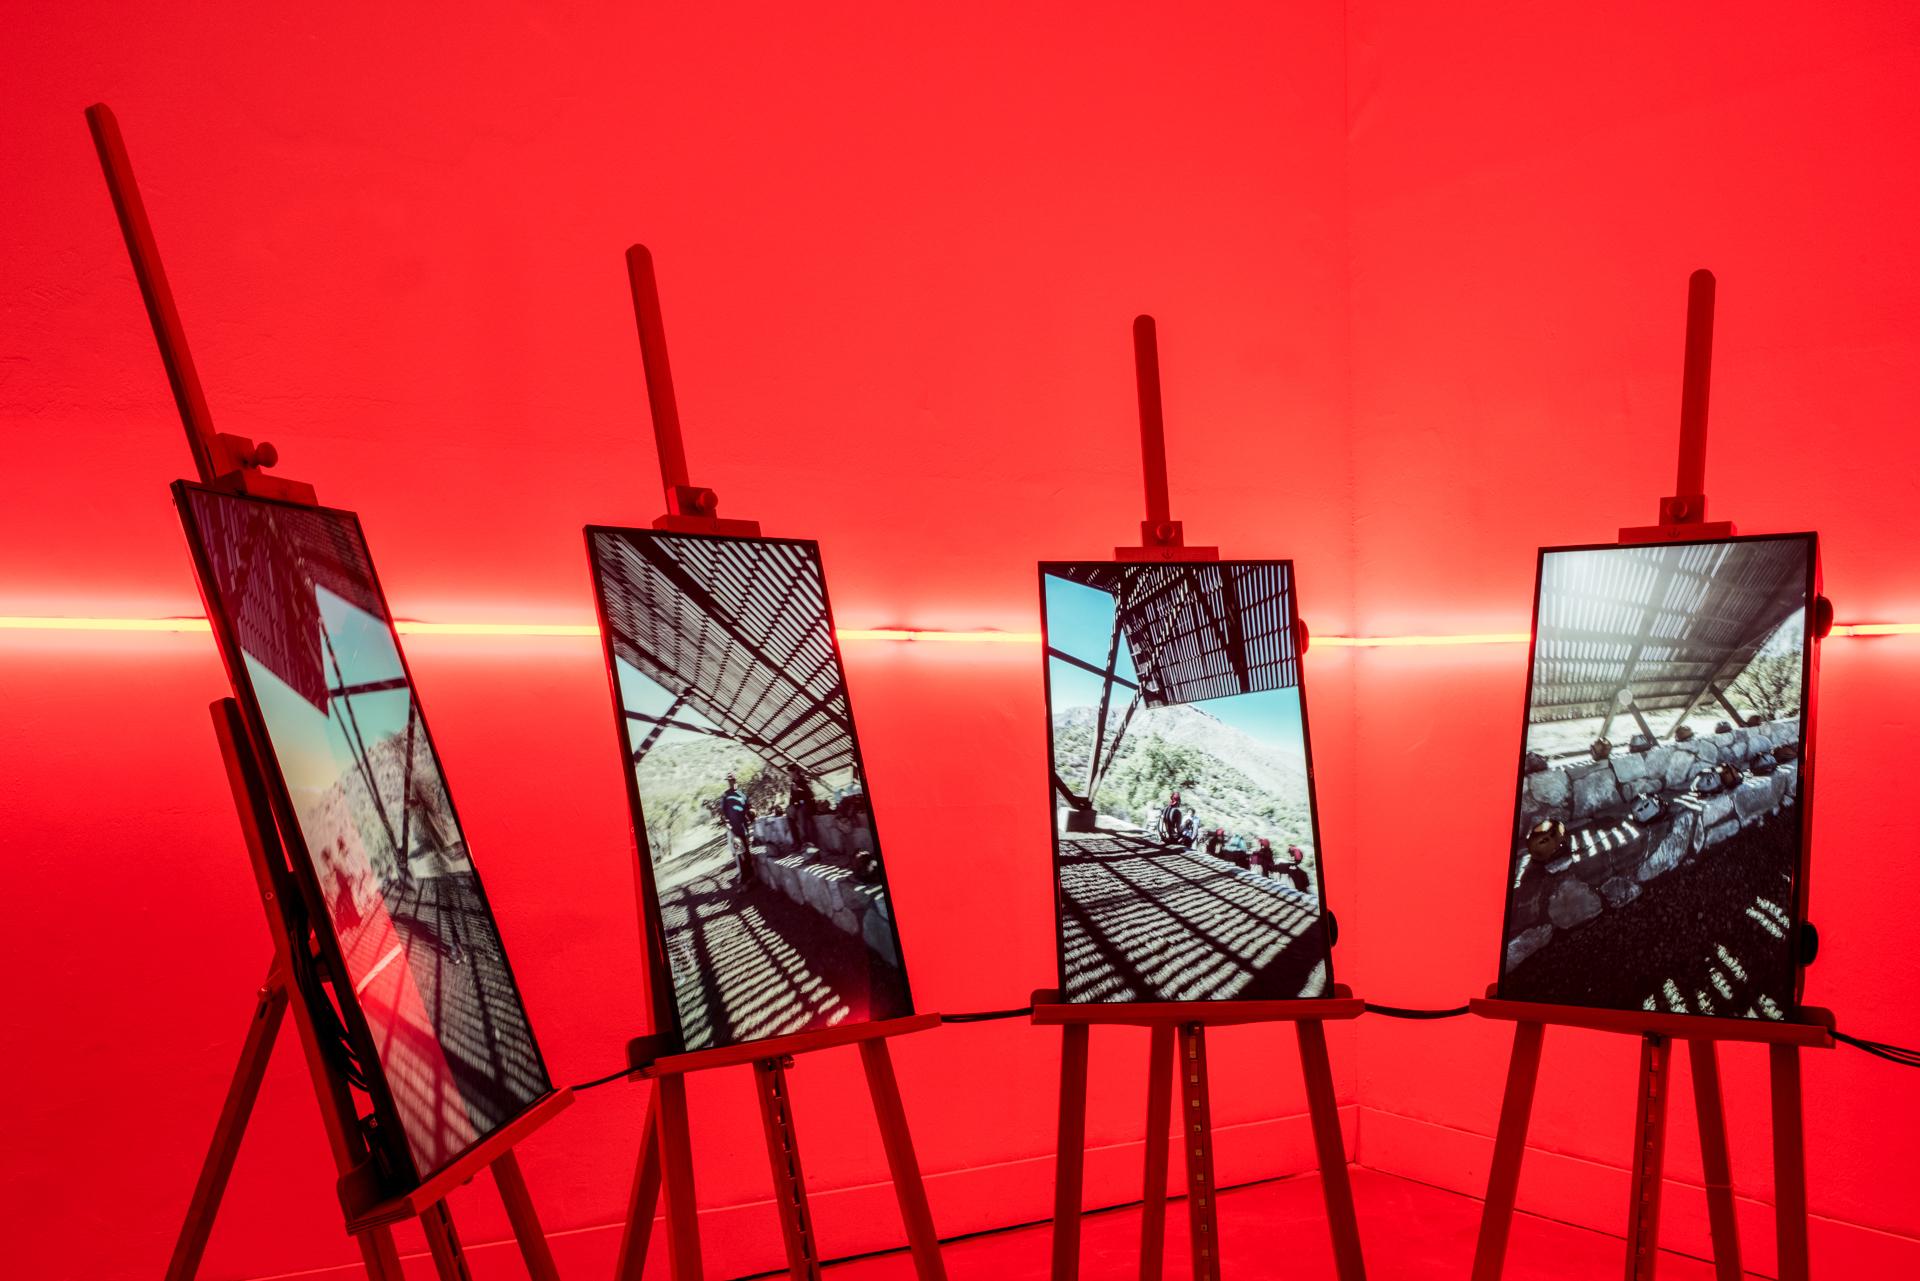 ANDES SHADOW La Biennale di Venezia 2016 © Gonzalo Puga-7814